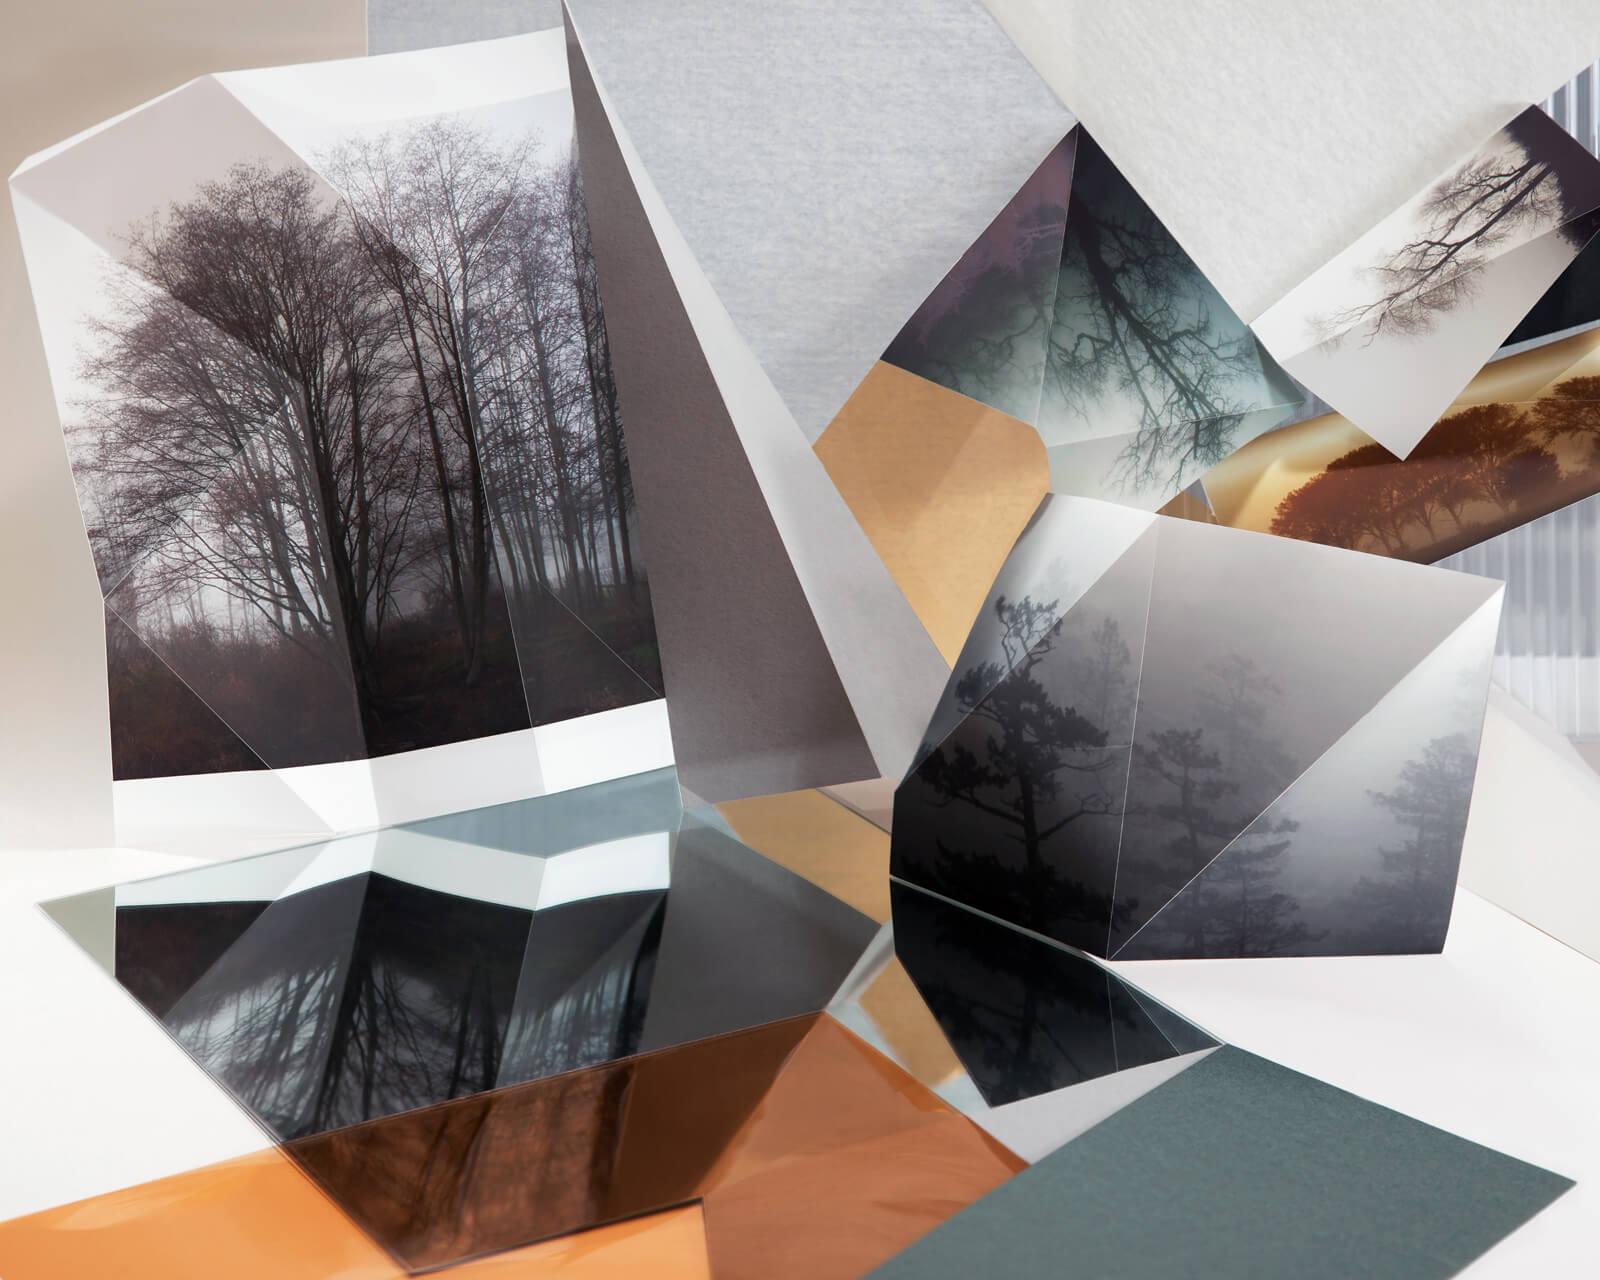 landscape_sublime-Anastasia_samoylova-yogurt_magazine_08